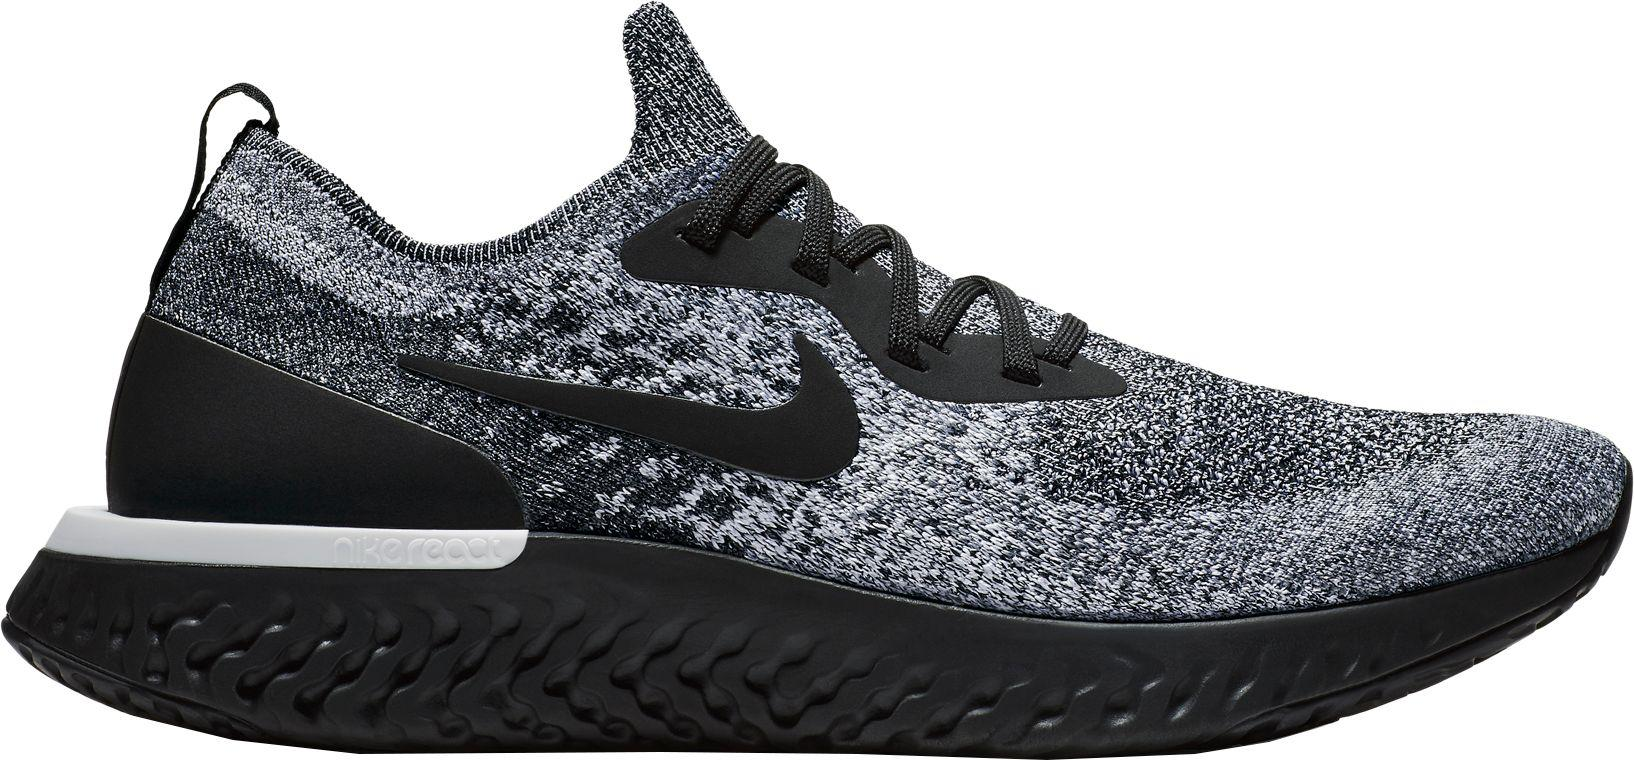 9b1dd87b3bb Nike Black Epic React Flyknit Running Shoes for men